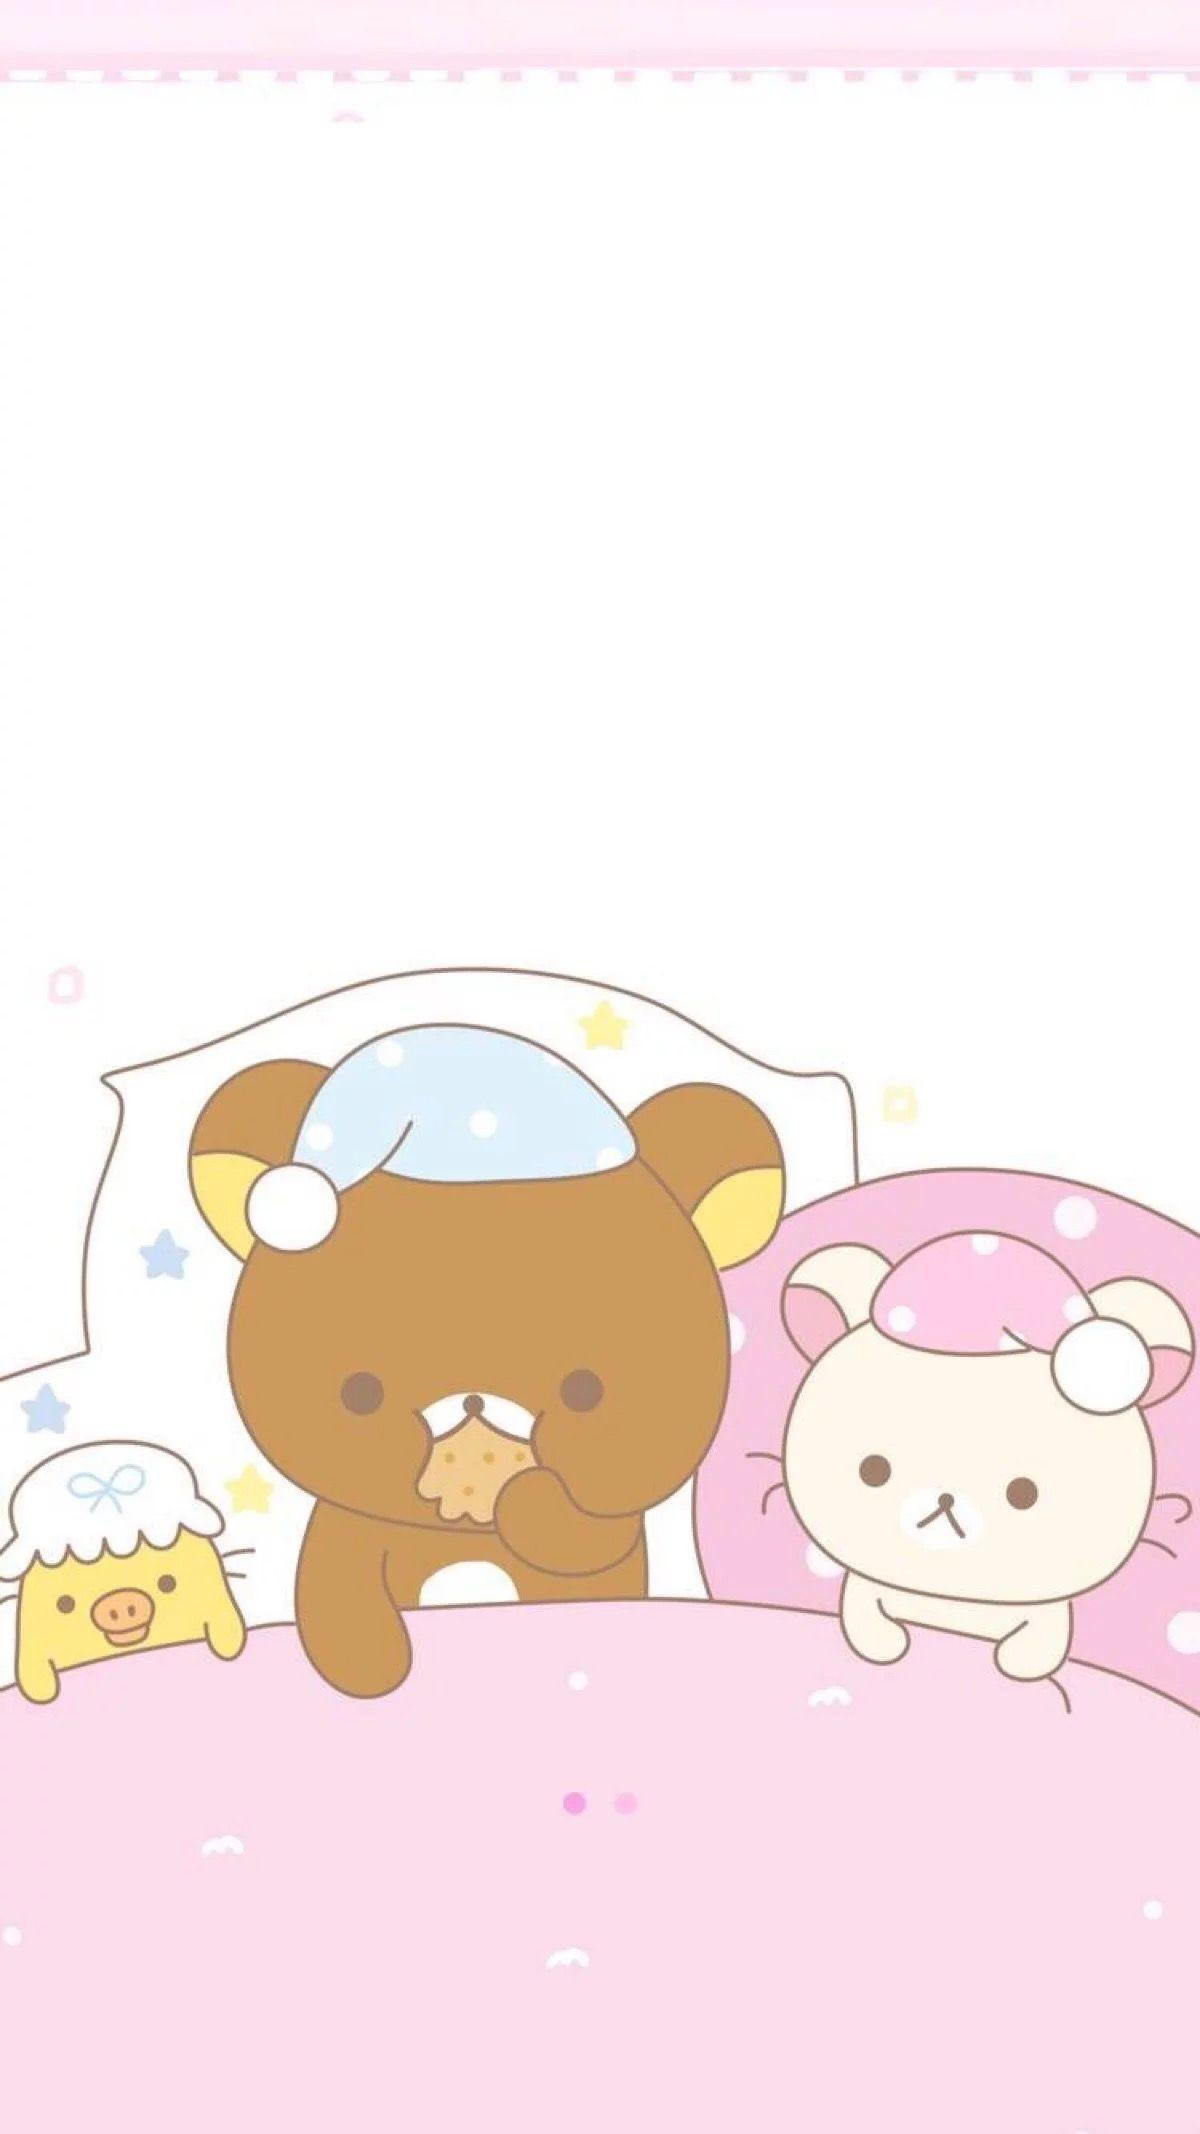 Res: 1200x2134, Rilakkuma, Telephone, Iphone Wallpapers, Chibi, Kawaii, Phone, Kawaii Cute,  Iphone Backgrounds